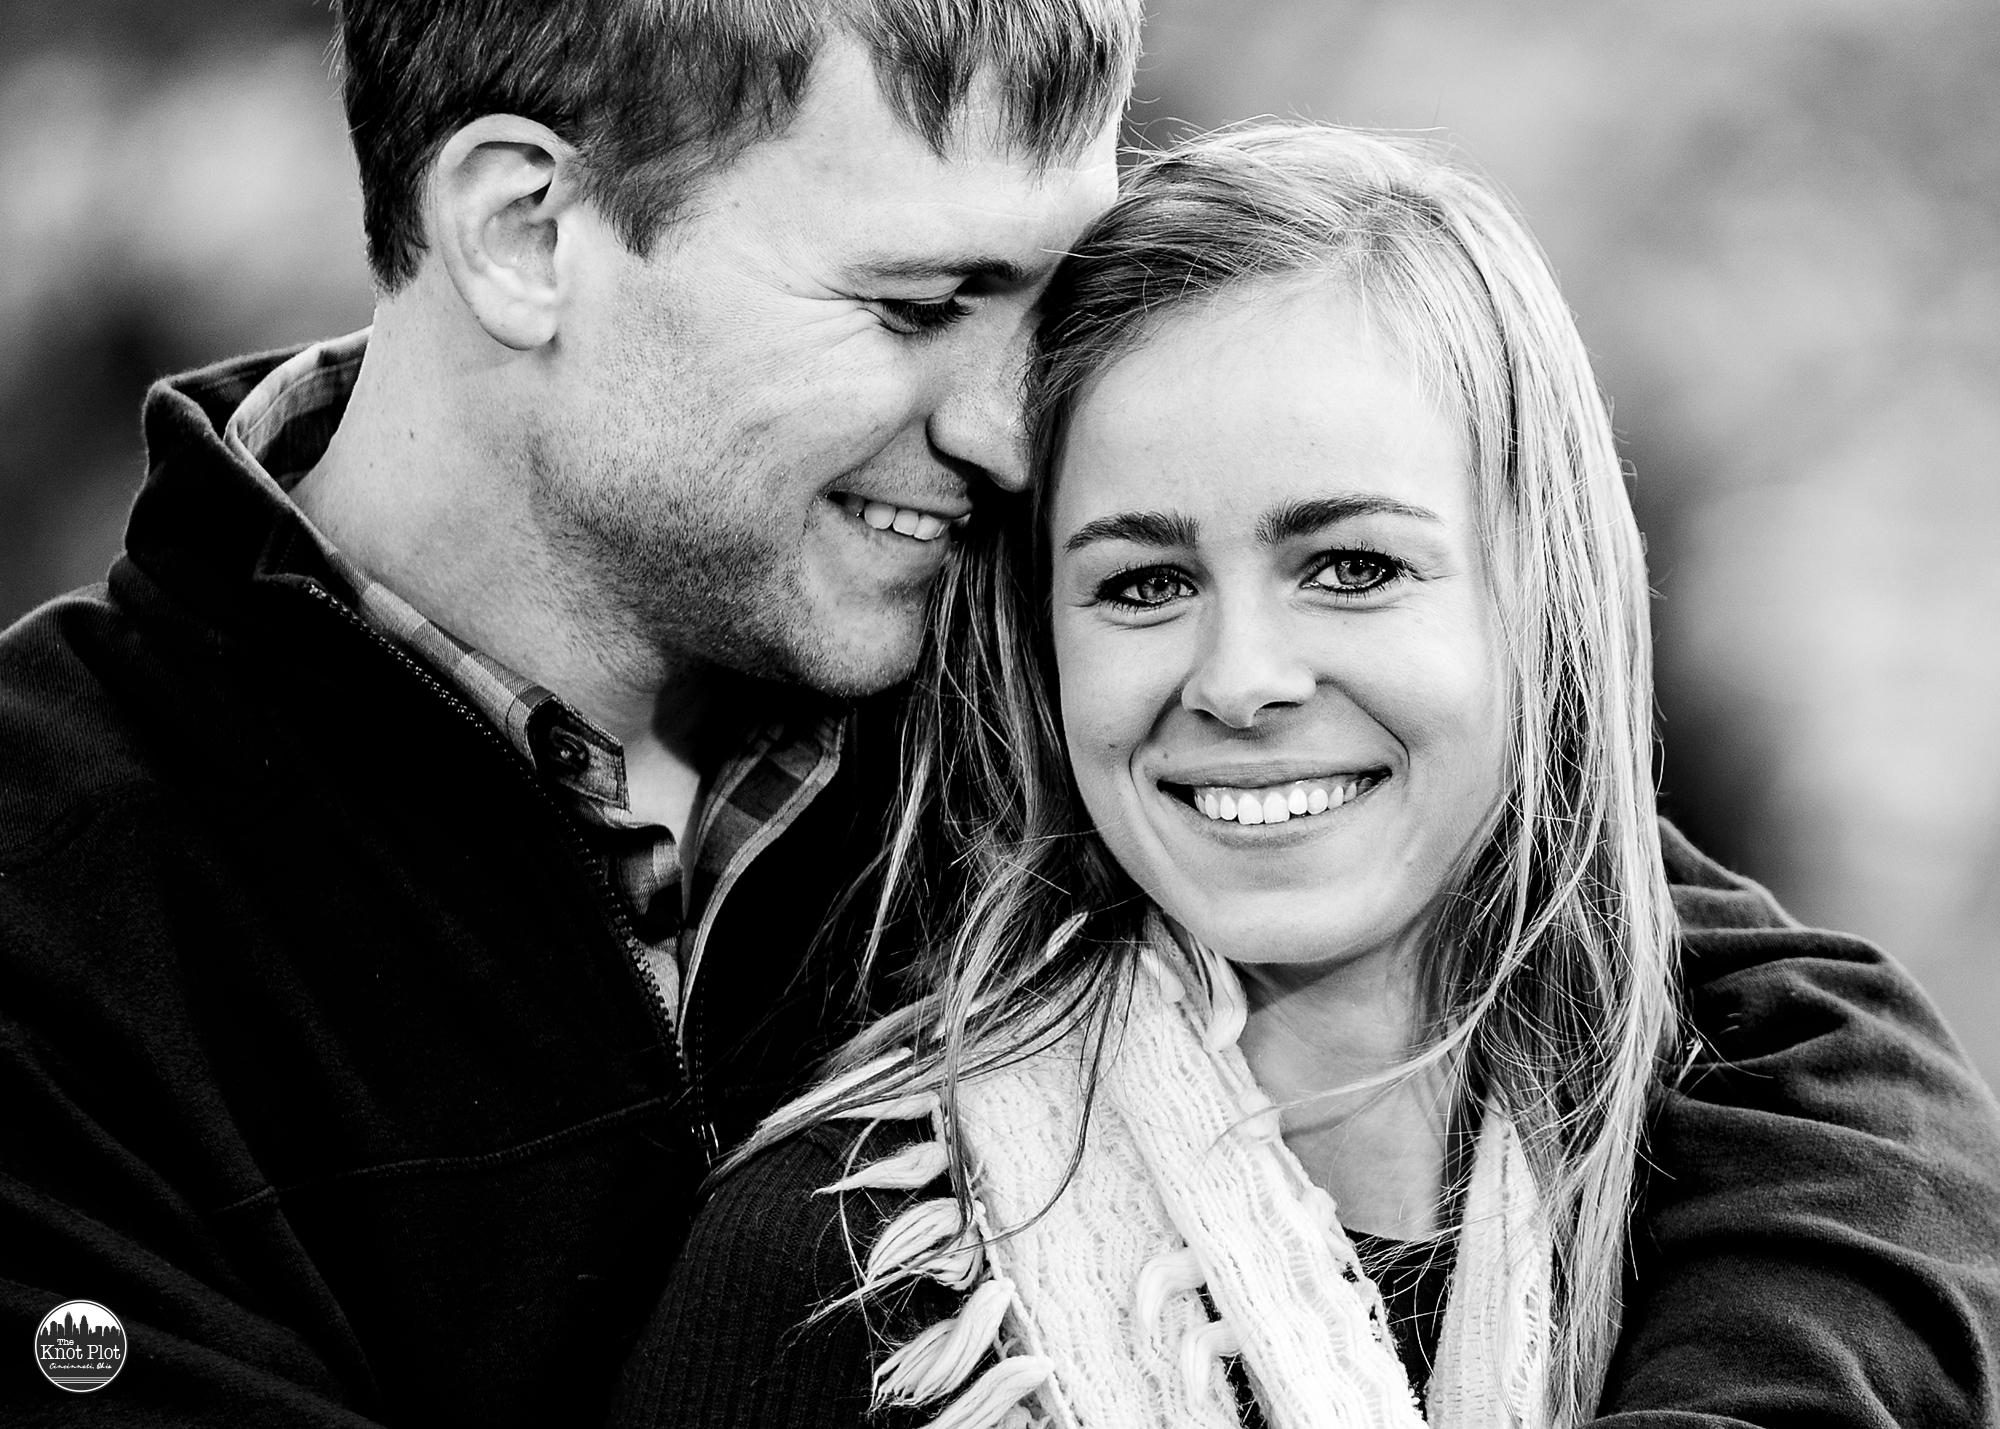 Mt-Airy-Arboretum-Engagement-Photography-Session-1.jpg